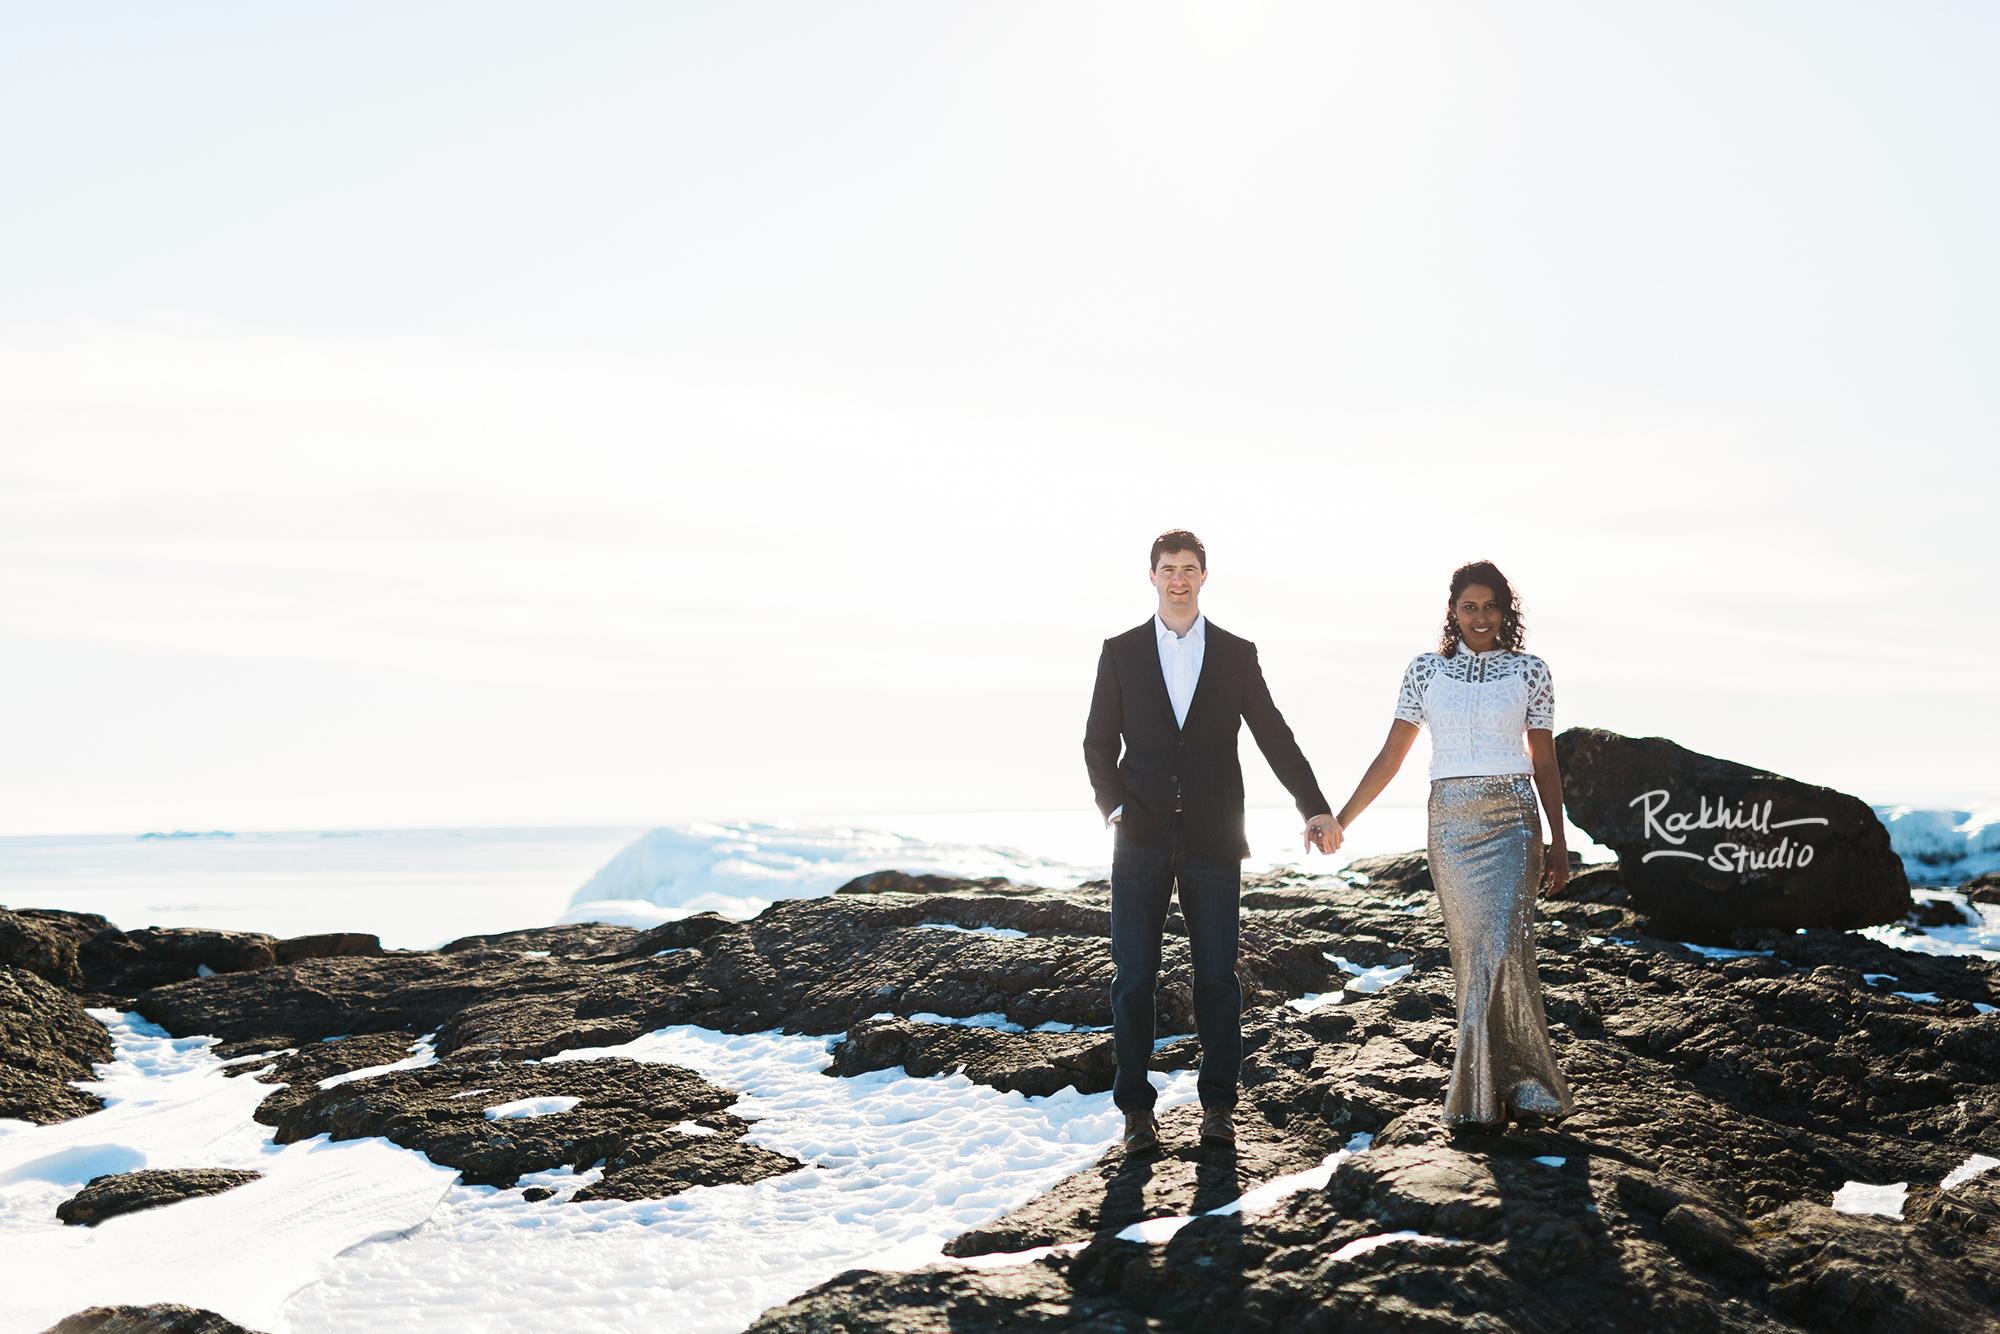 northern-michigan-wedding-marquette-engagement-upper-peninsula-michigan-rockhill-winter-9.jpg